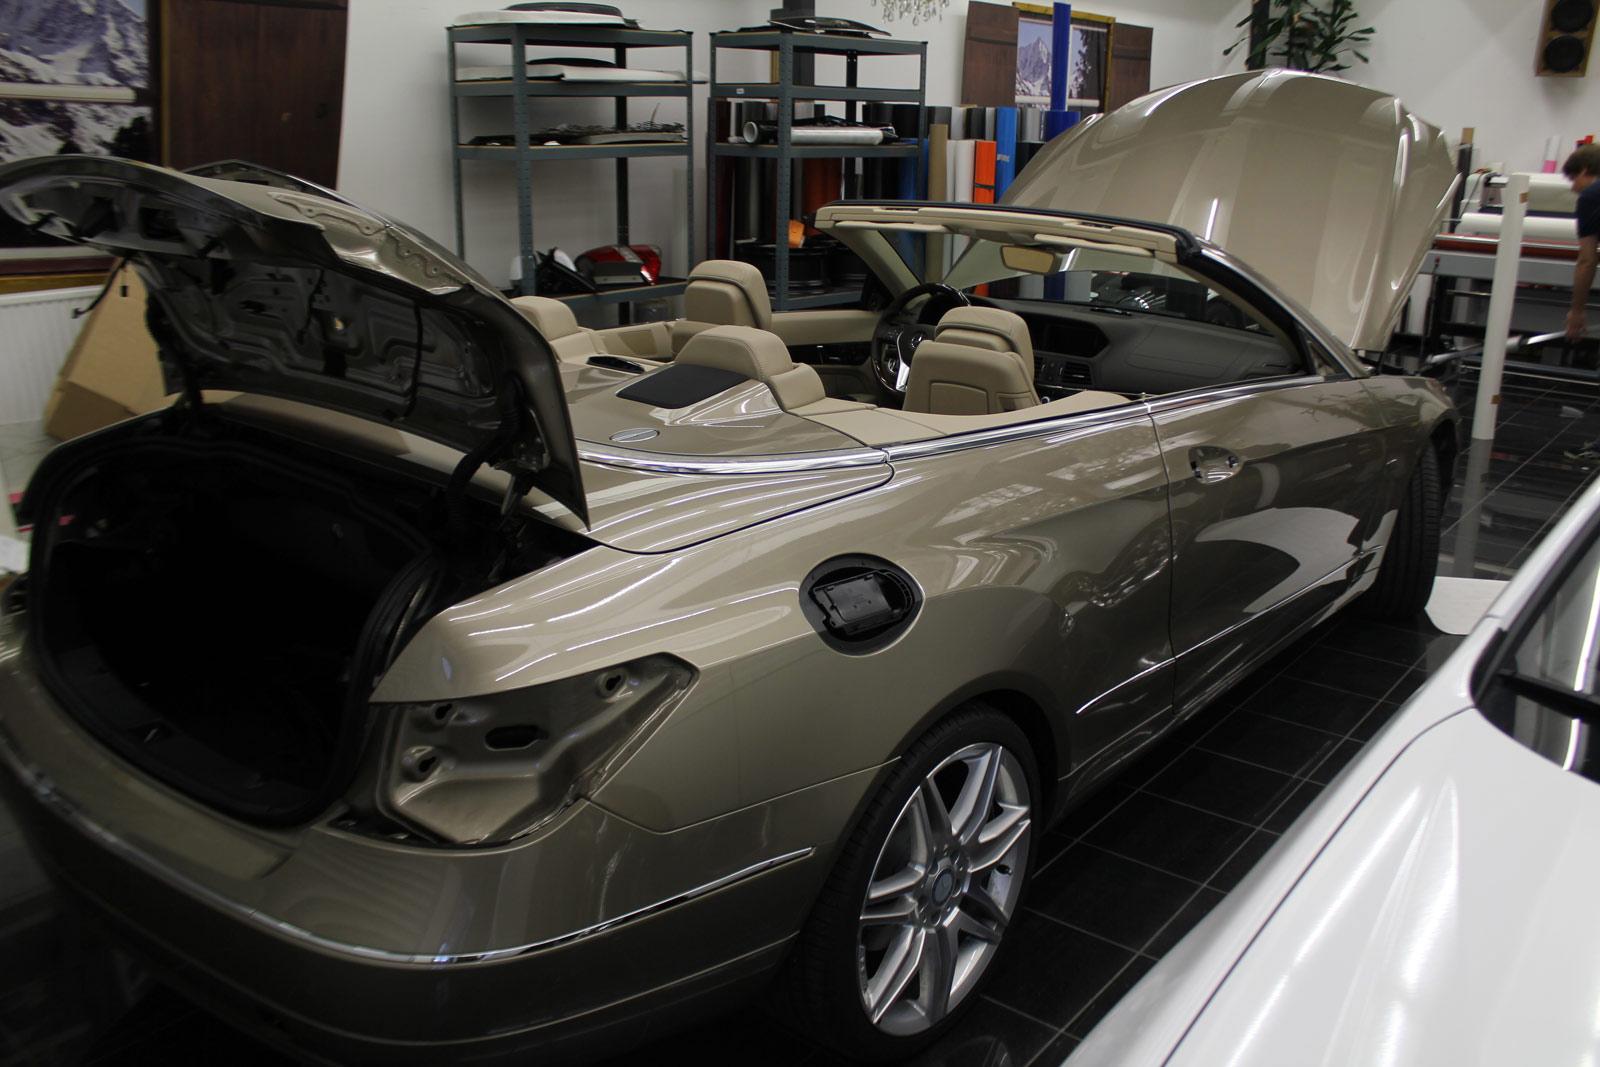 Mercedes_E-Klasse_Cabrio_Folierung_Stannitgrau_Metallic_Glanz_02